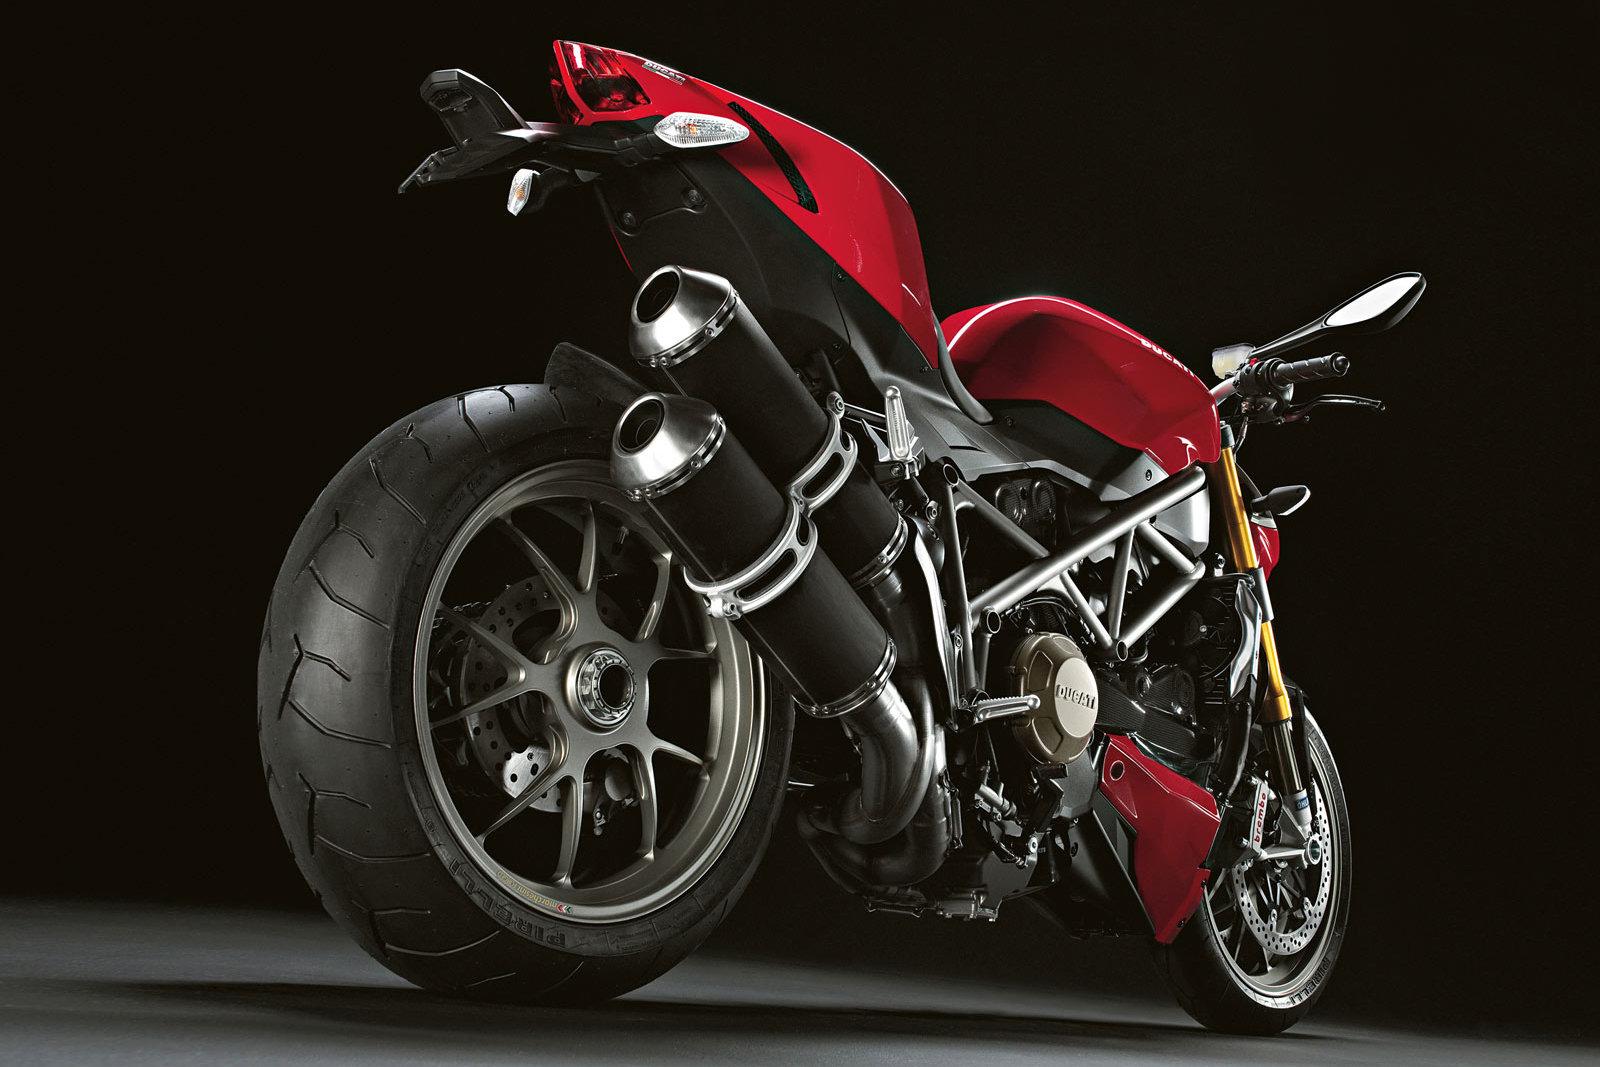 Ducati Streetfighter 1100 S 3